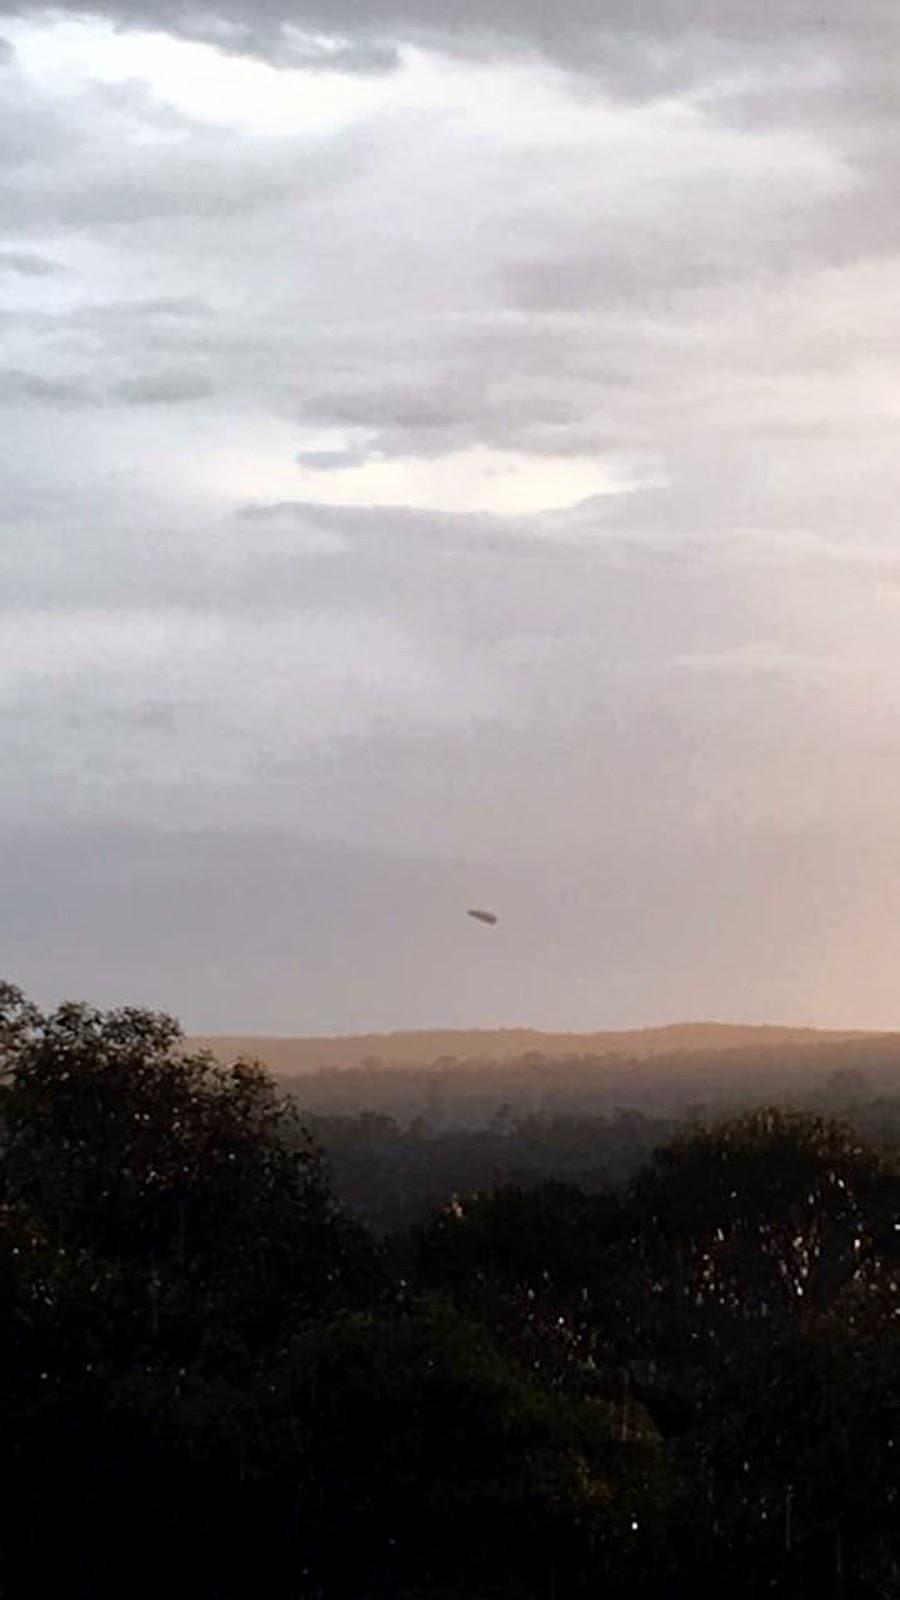 UFO News ~  UFOs Tracked Over Australia plus MORE Sunset%252C%2Bmufon%252C%2Bcloak%252C%2BUFO%252C%2BUFOs%252C%2Bsighting%252C%2Bsightings%252C%2Balien%252C%2Baliens%252C%2BVoyager%252C%2BStar%2BTrek%252C%2BNews%252C%2Bmovies%252C%2Bshows%252C%2BSpoke%252C%2BKirk22